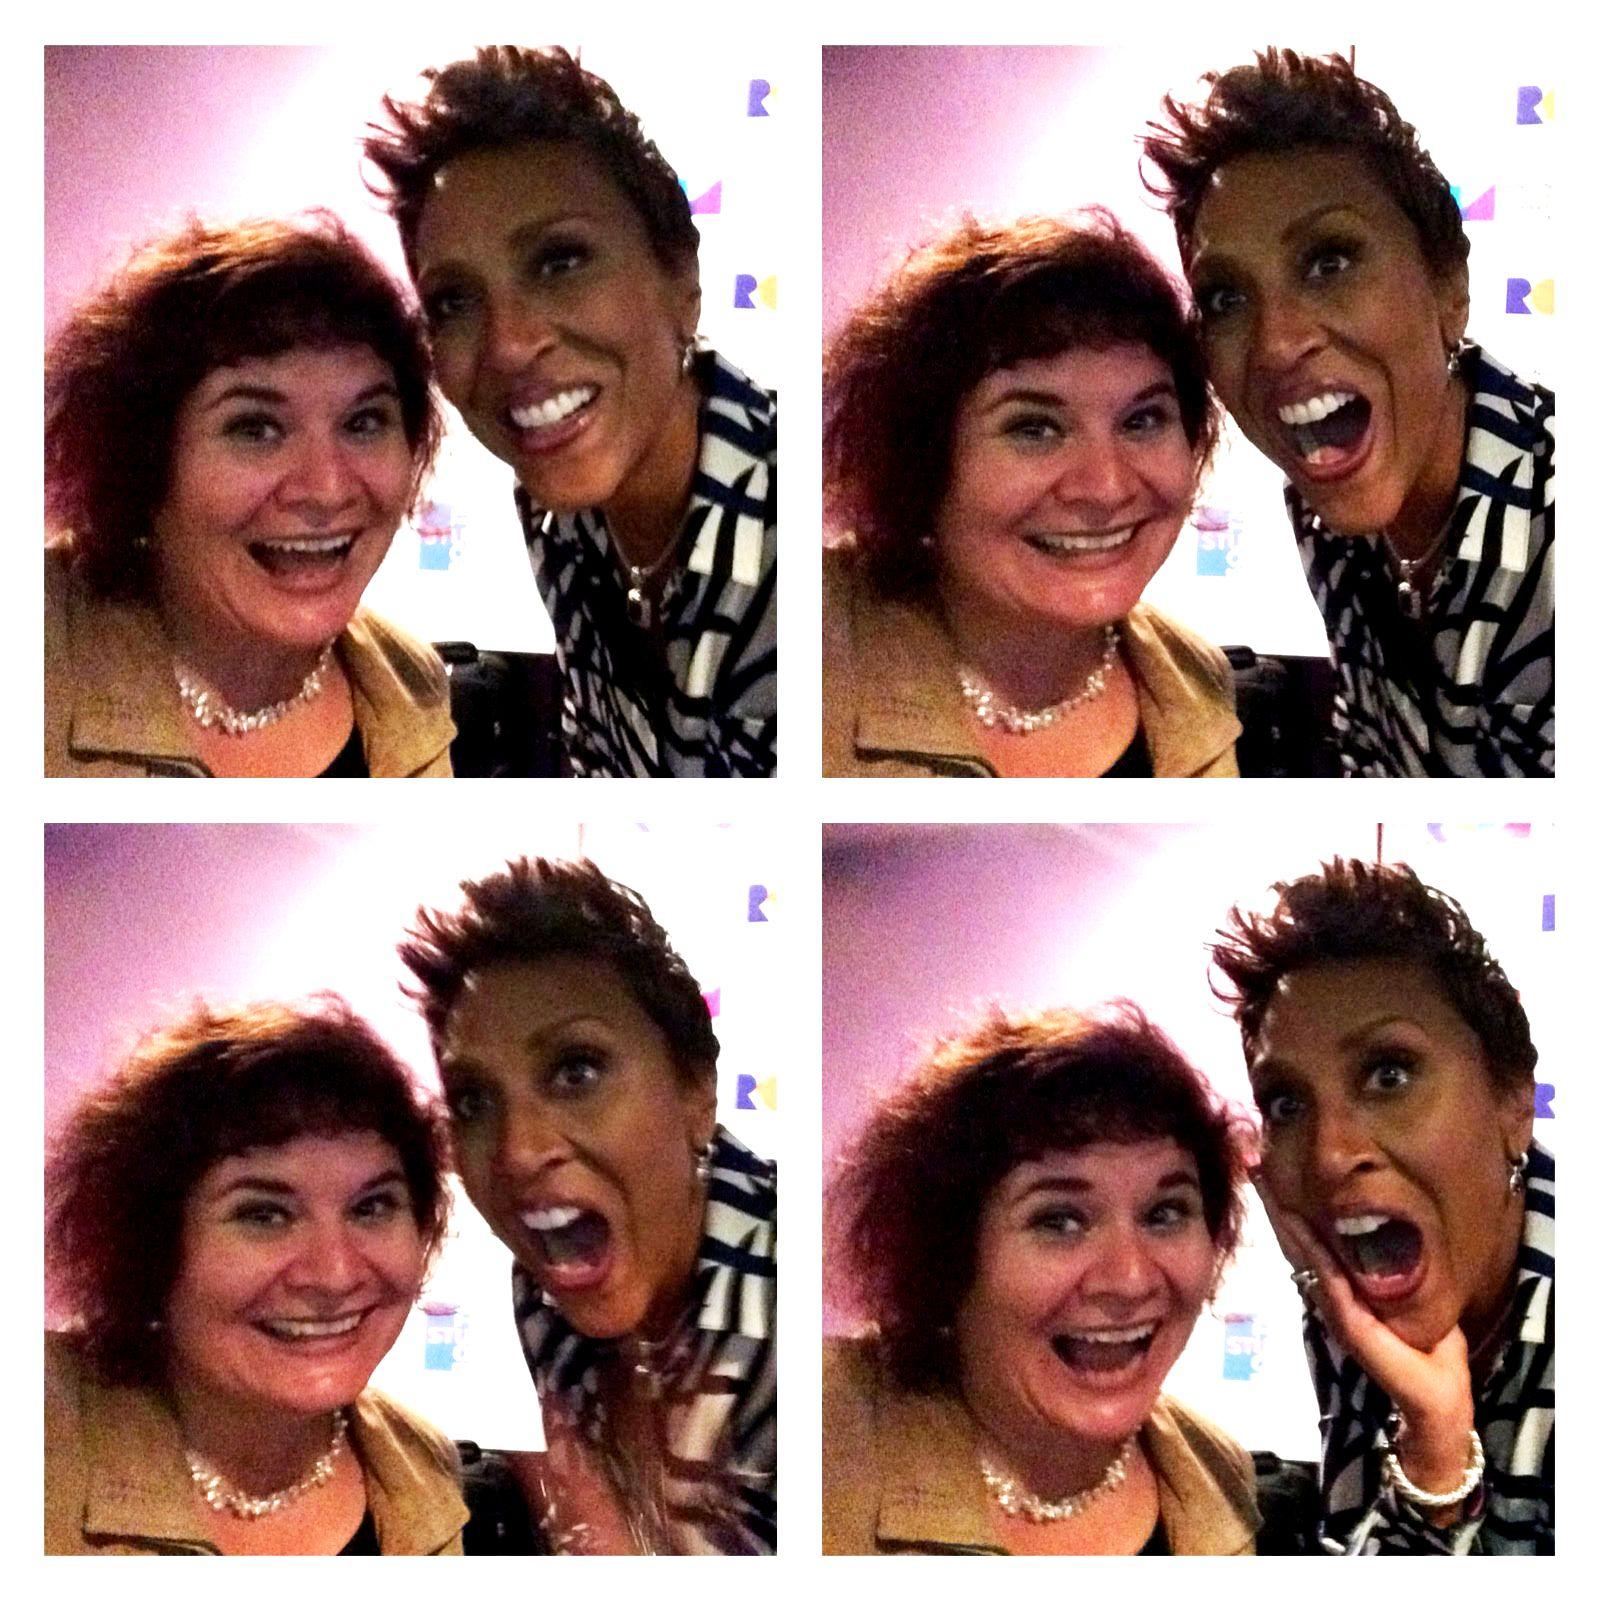 Selfie Fun with Robin Roberts, Sarasota, Fla., March 8, 2016